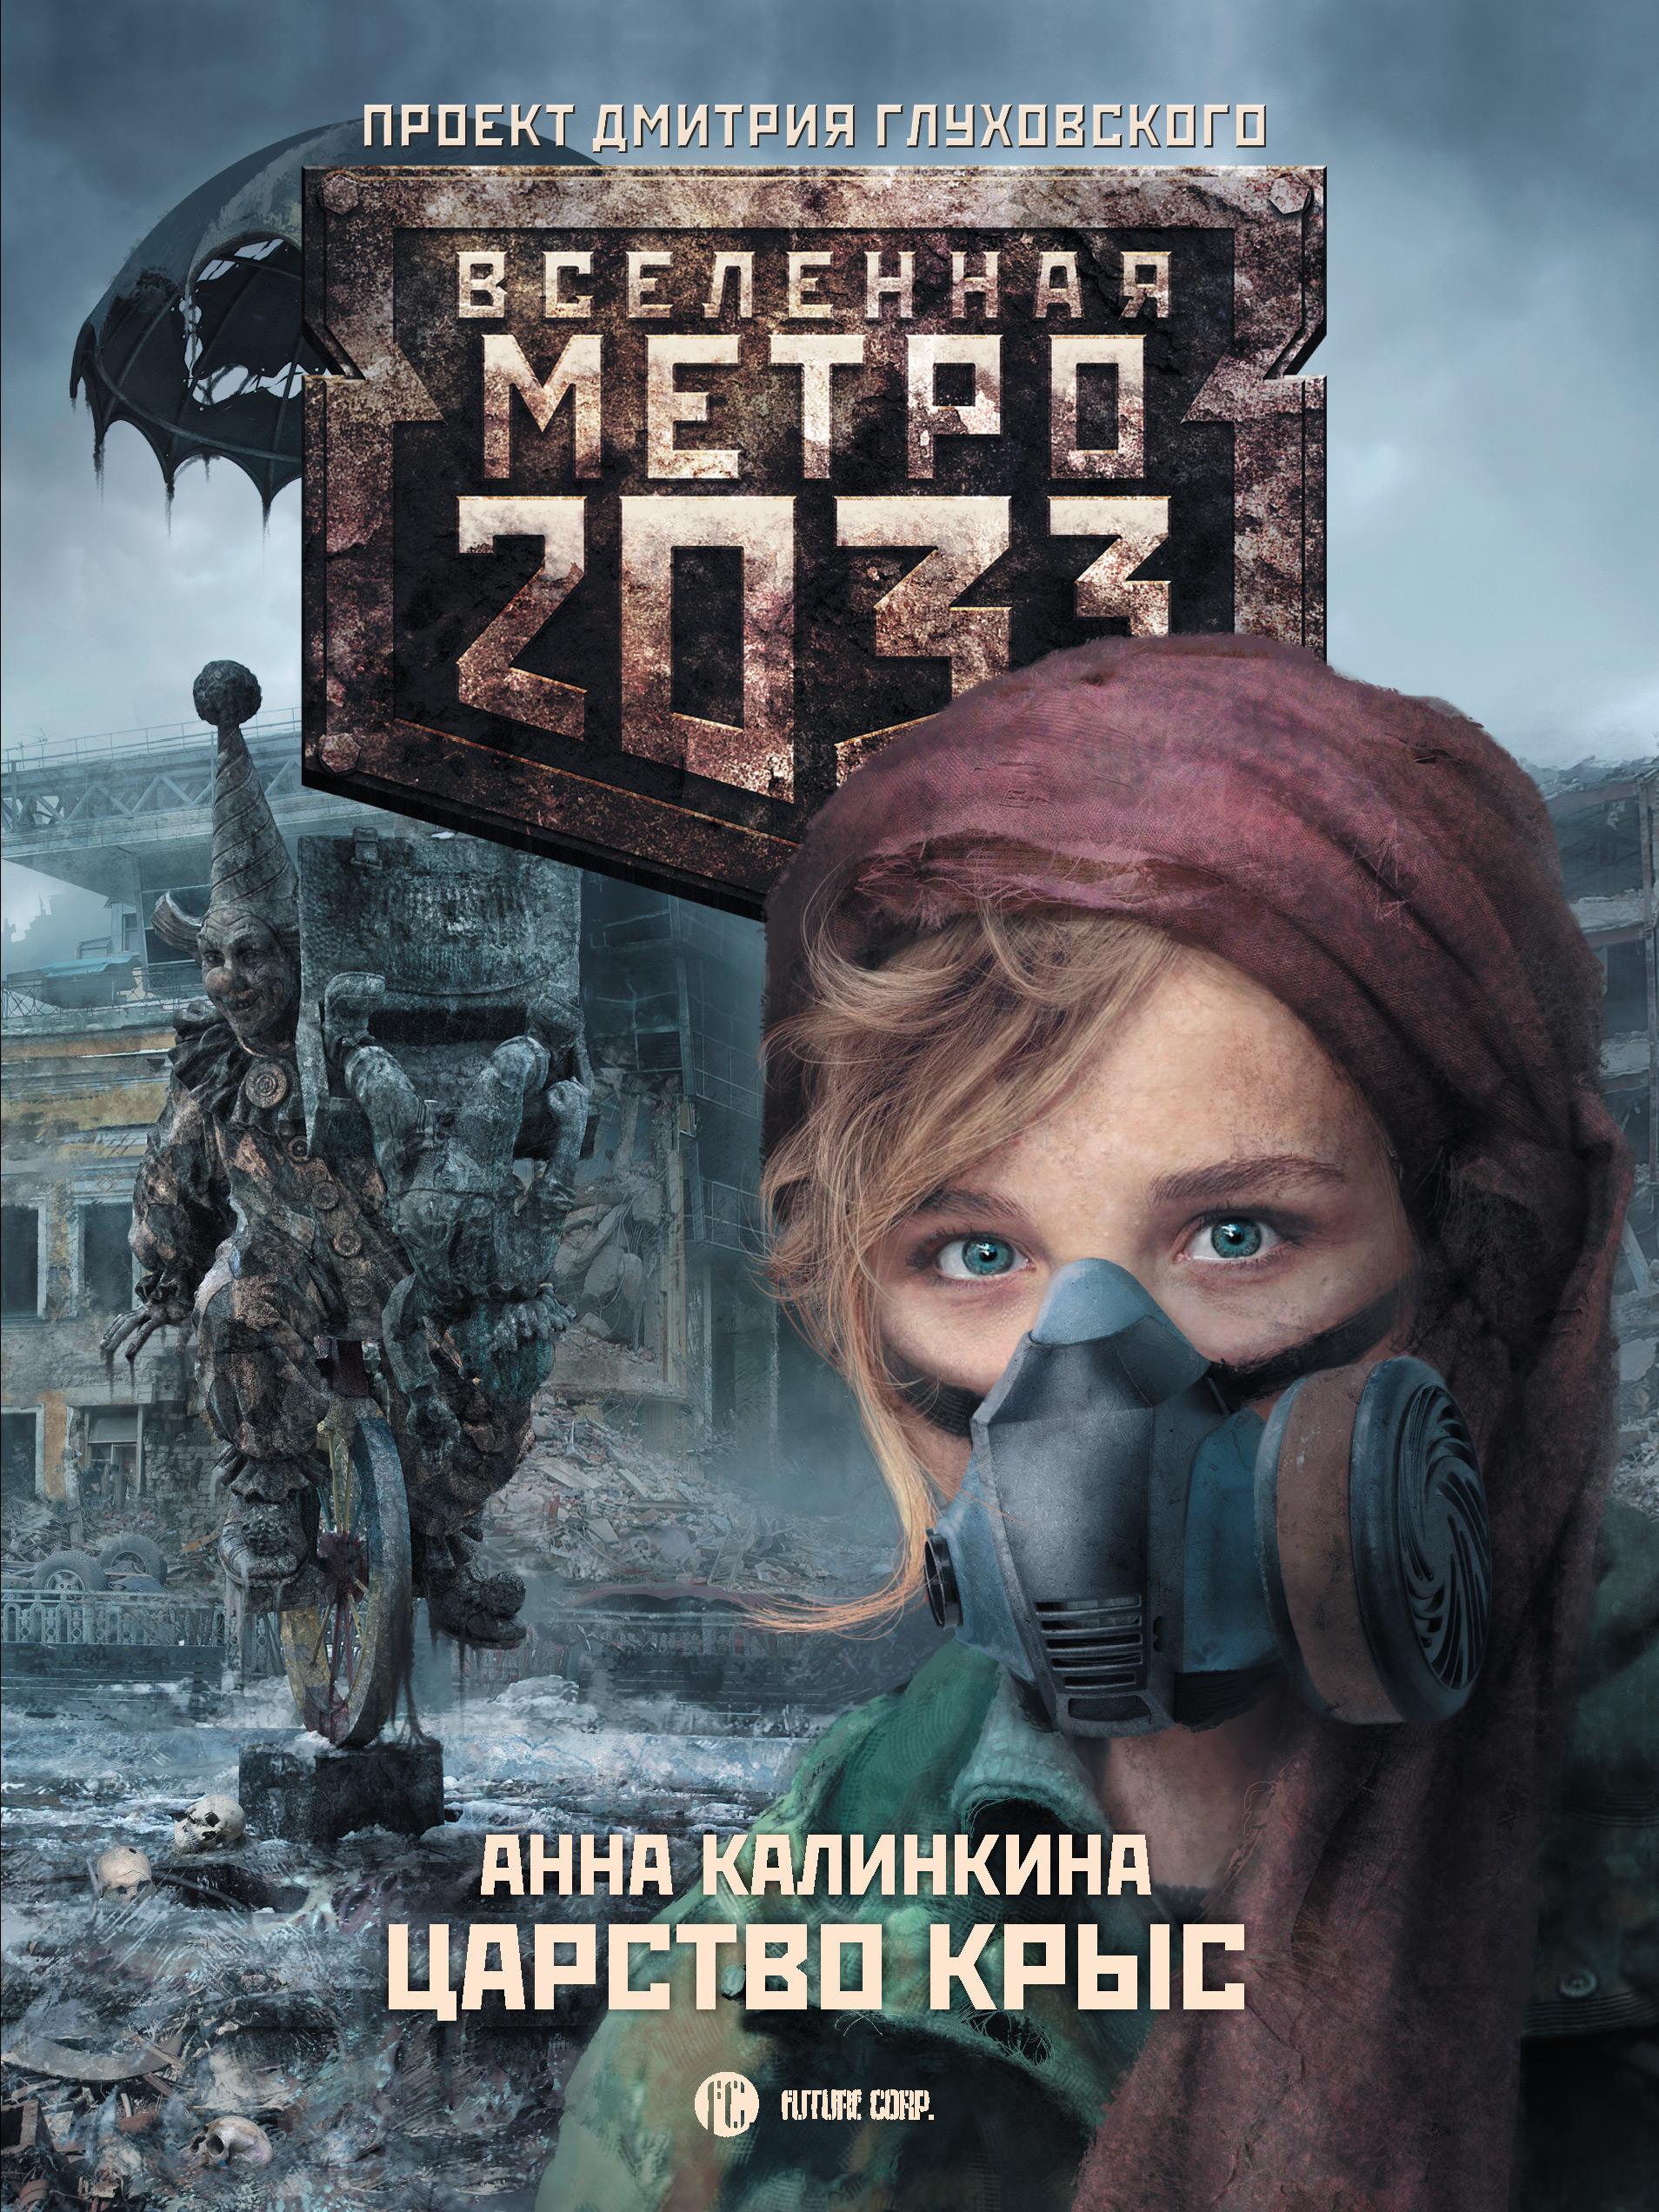 Анна Калинкина Метро 2033: Царство крыс анна калинкина царство крыс